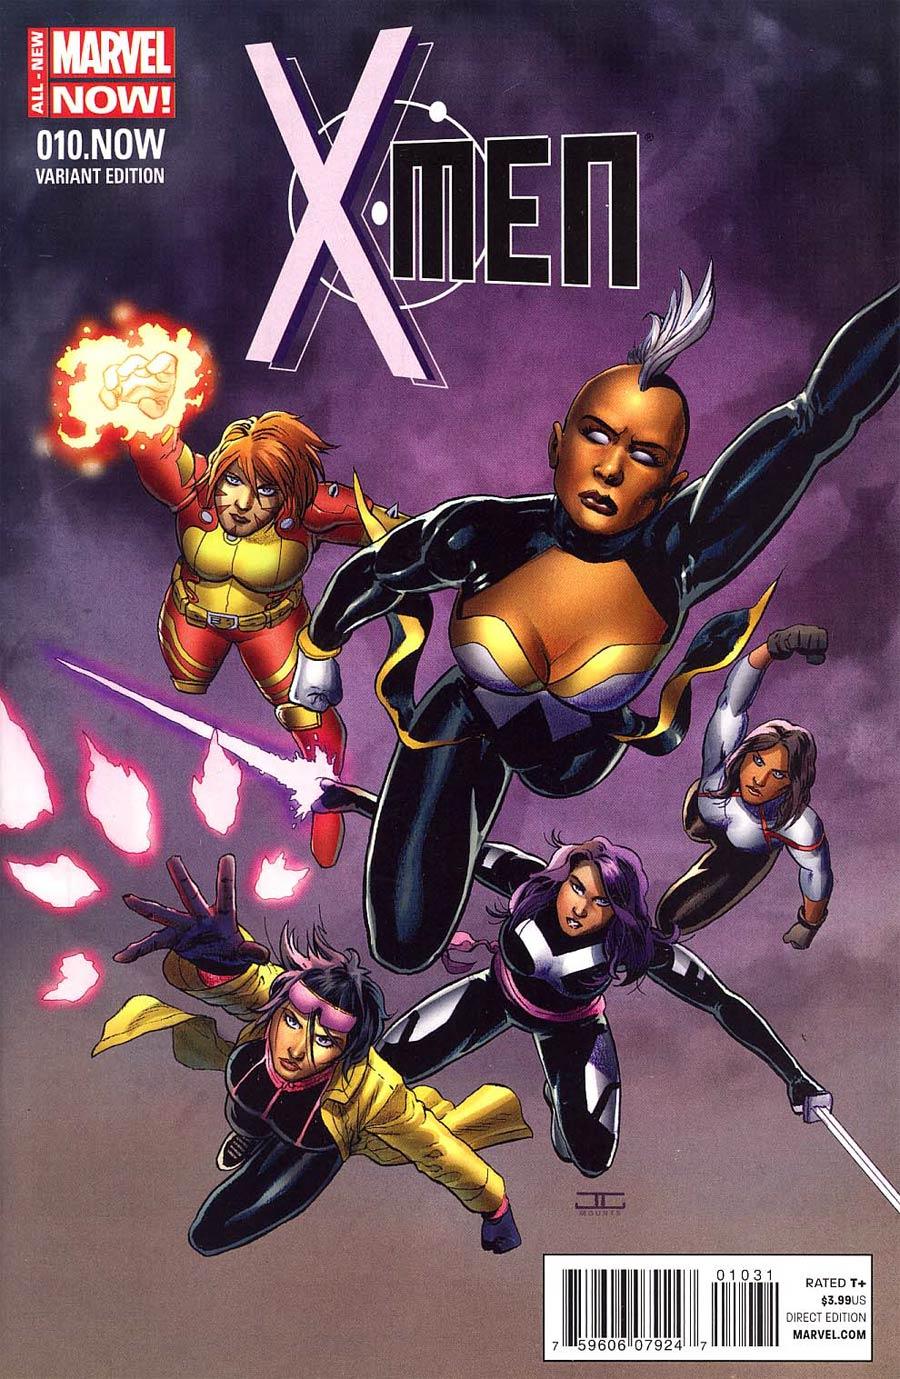 X-Men Vol 4 #10.NOW Cover C Incentive John Cassaday Color Variant Cover